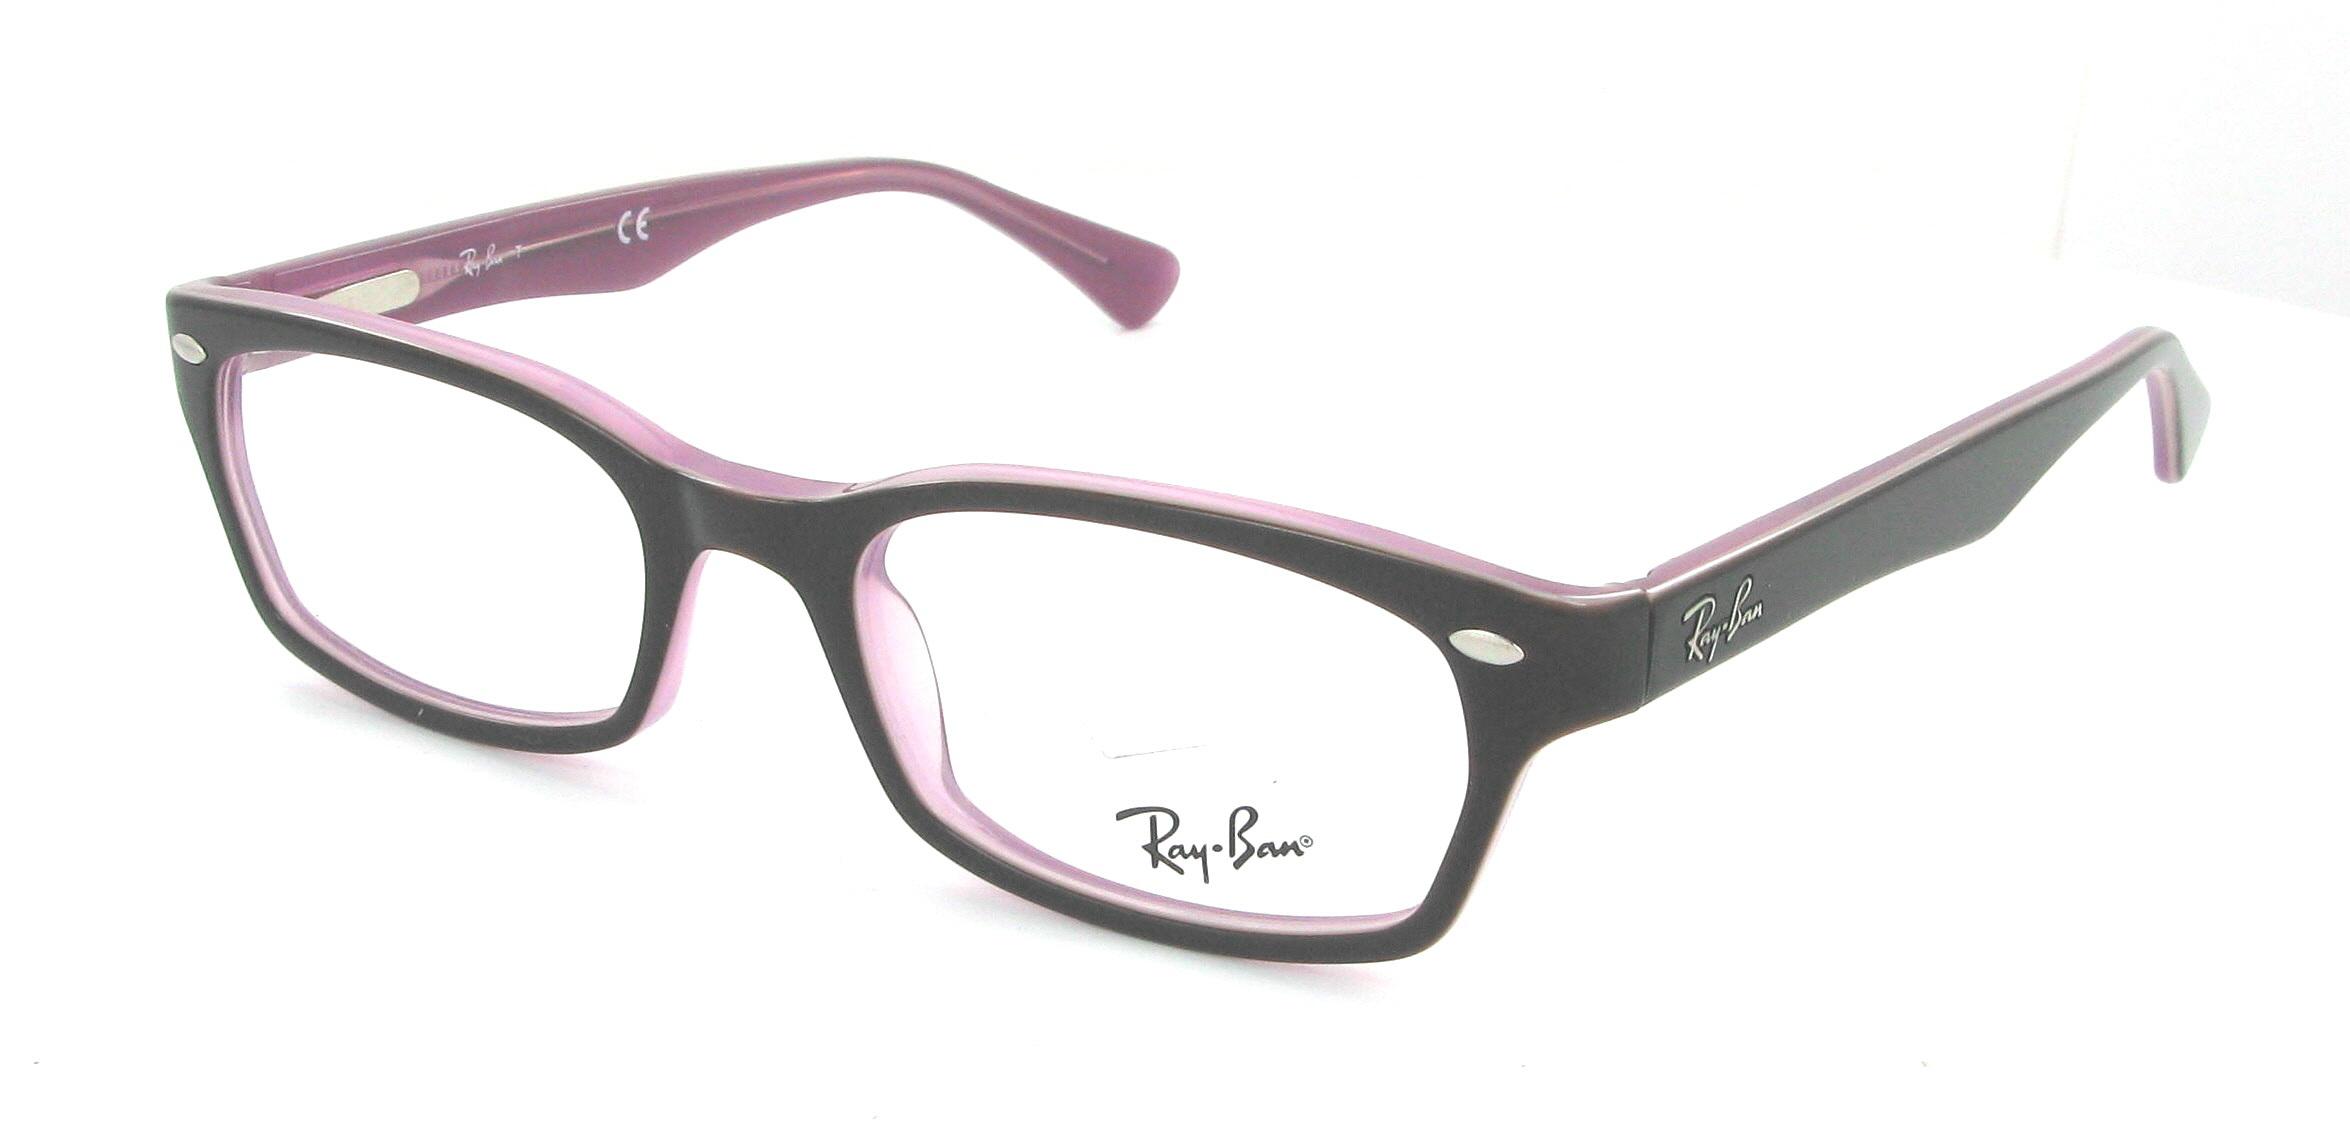 essayage de ray-ban virtuel Lunettes de marque direct optic ray-ban carrera boss orange calvin klein police boll sur chaque fiche produit de lunettes de vue ou de lunettes de.